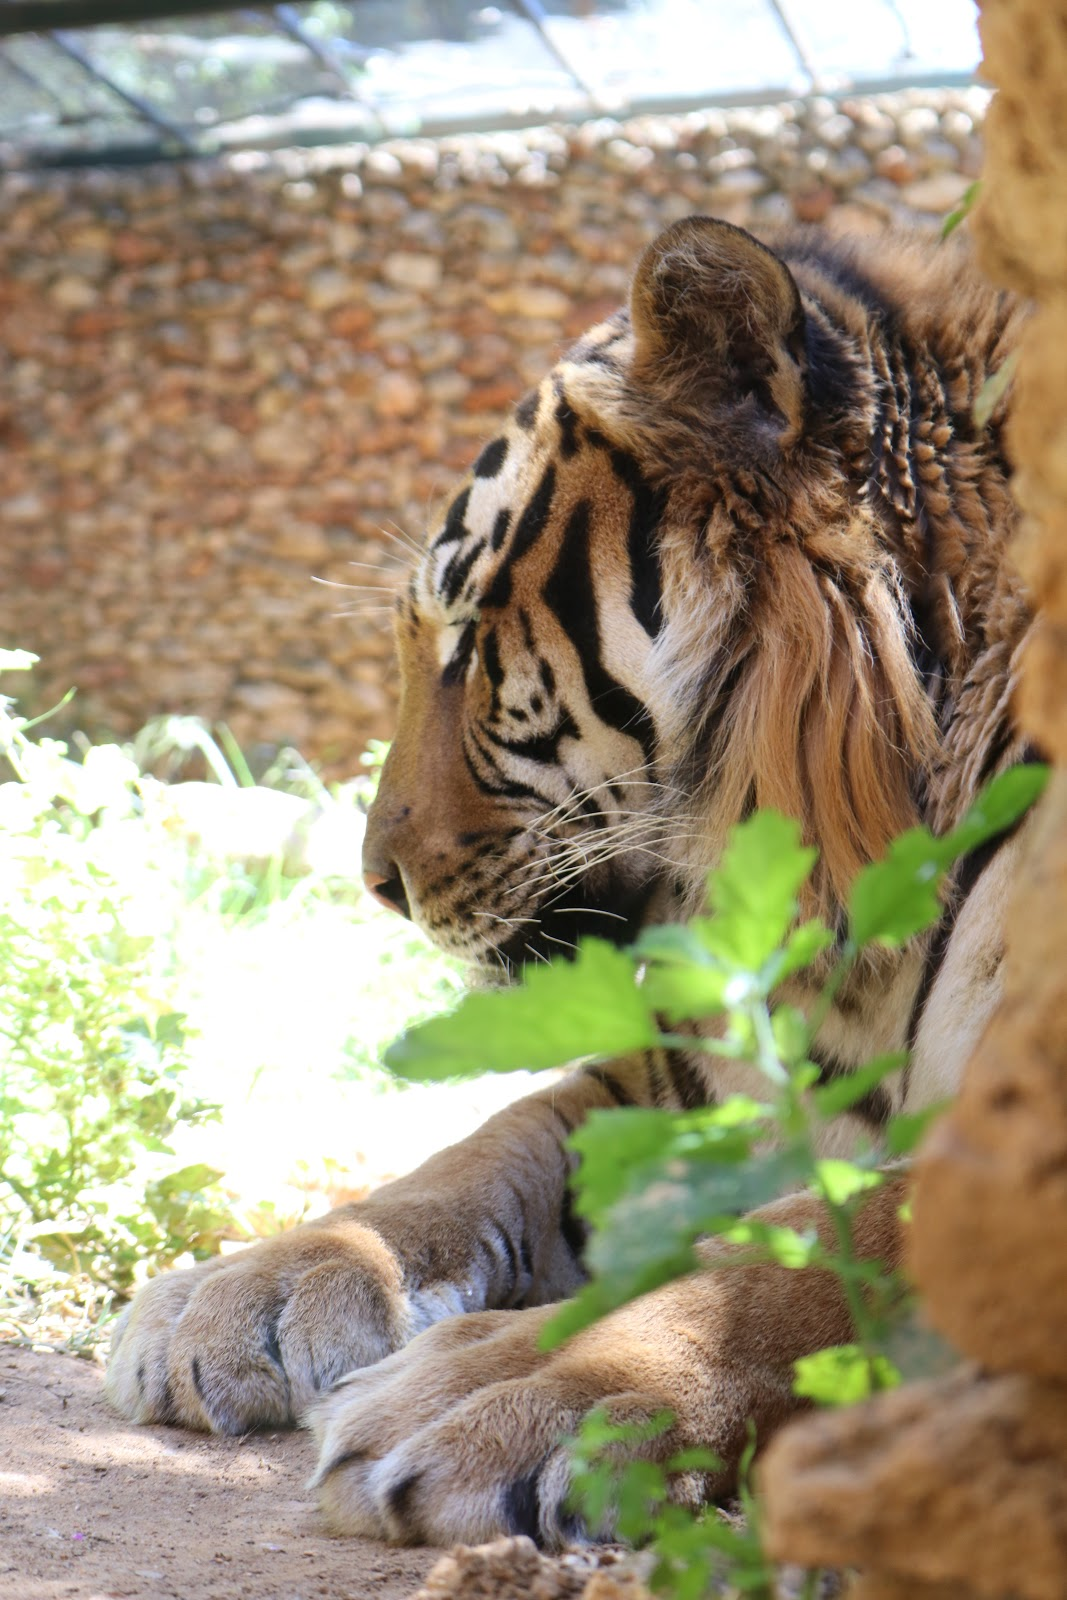 A Tiger in Zoo De Castellar, Spain